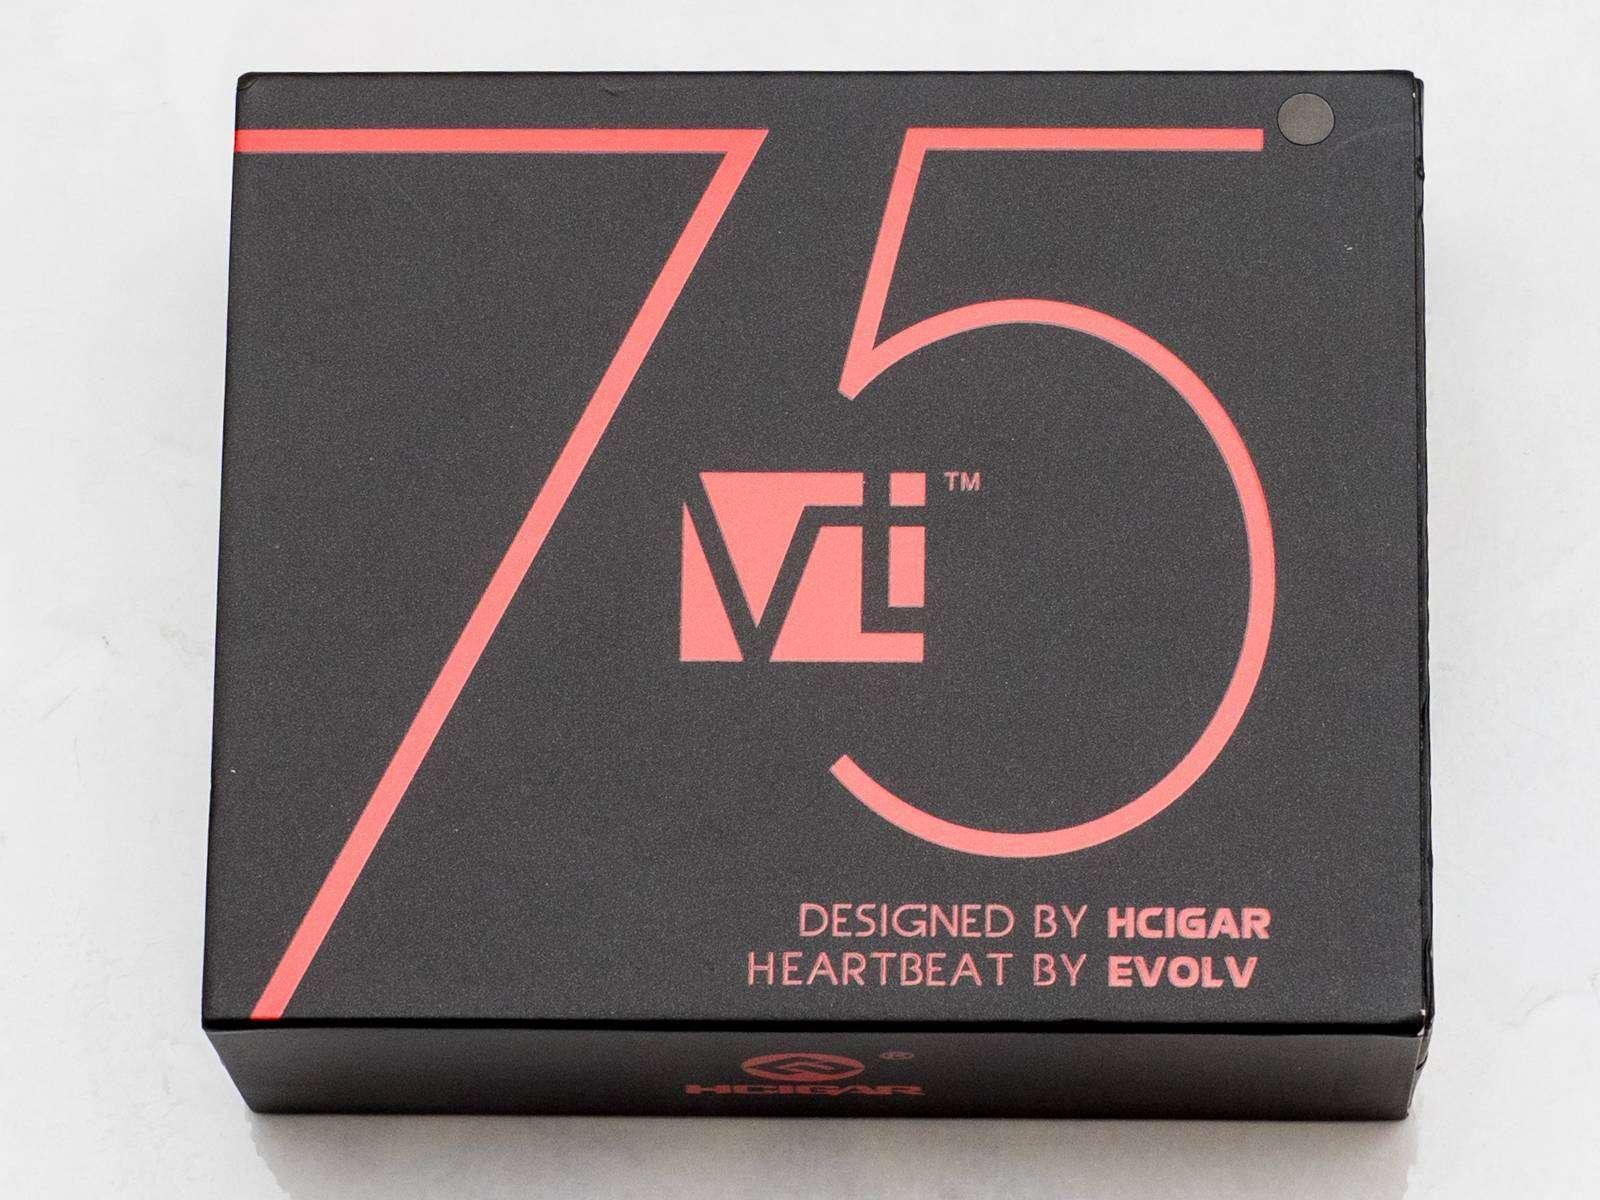 GearBest: Обзор боксмода HCigar VT75 не с точки зрения вайпера